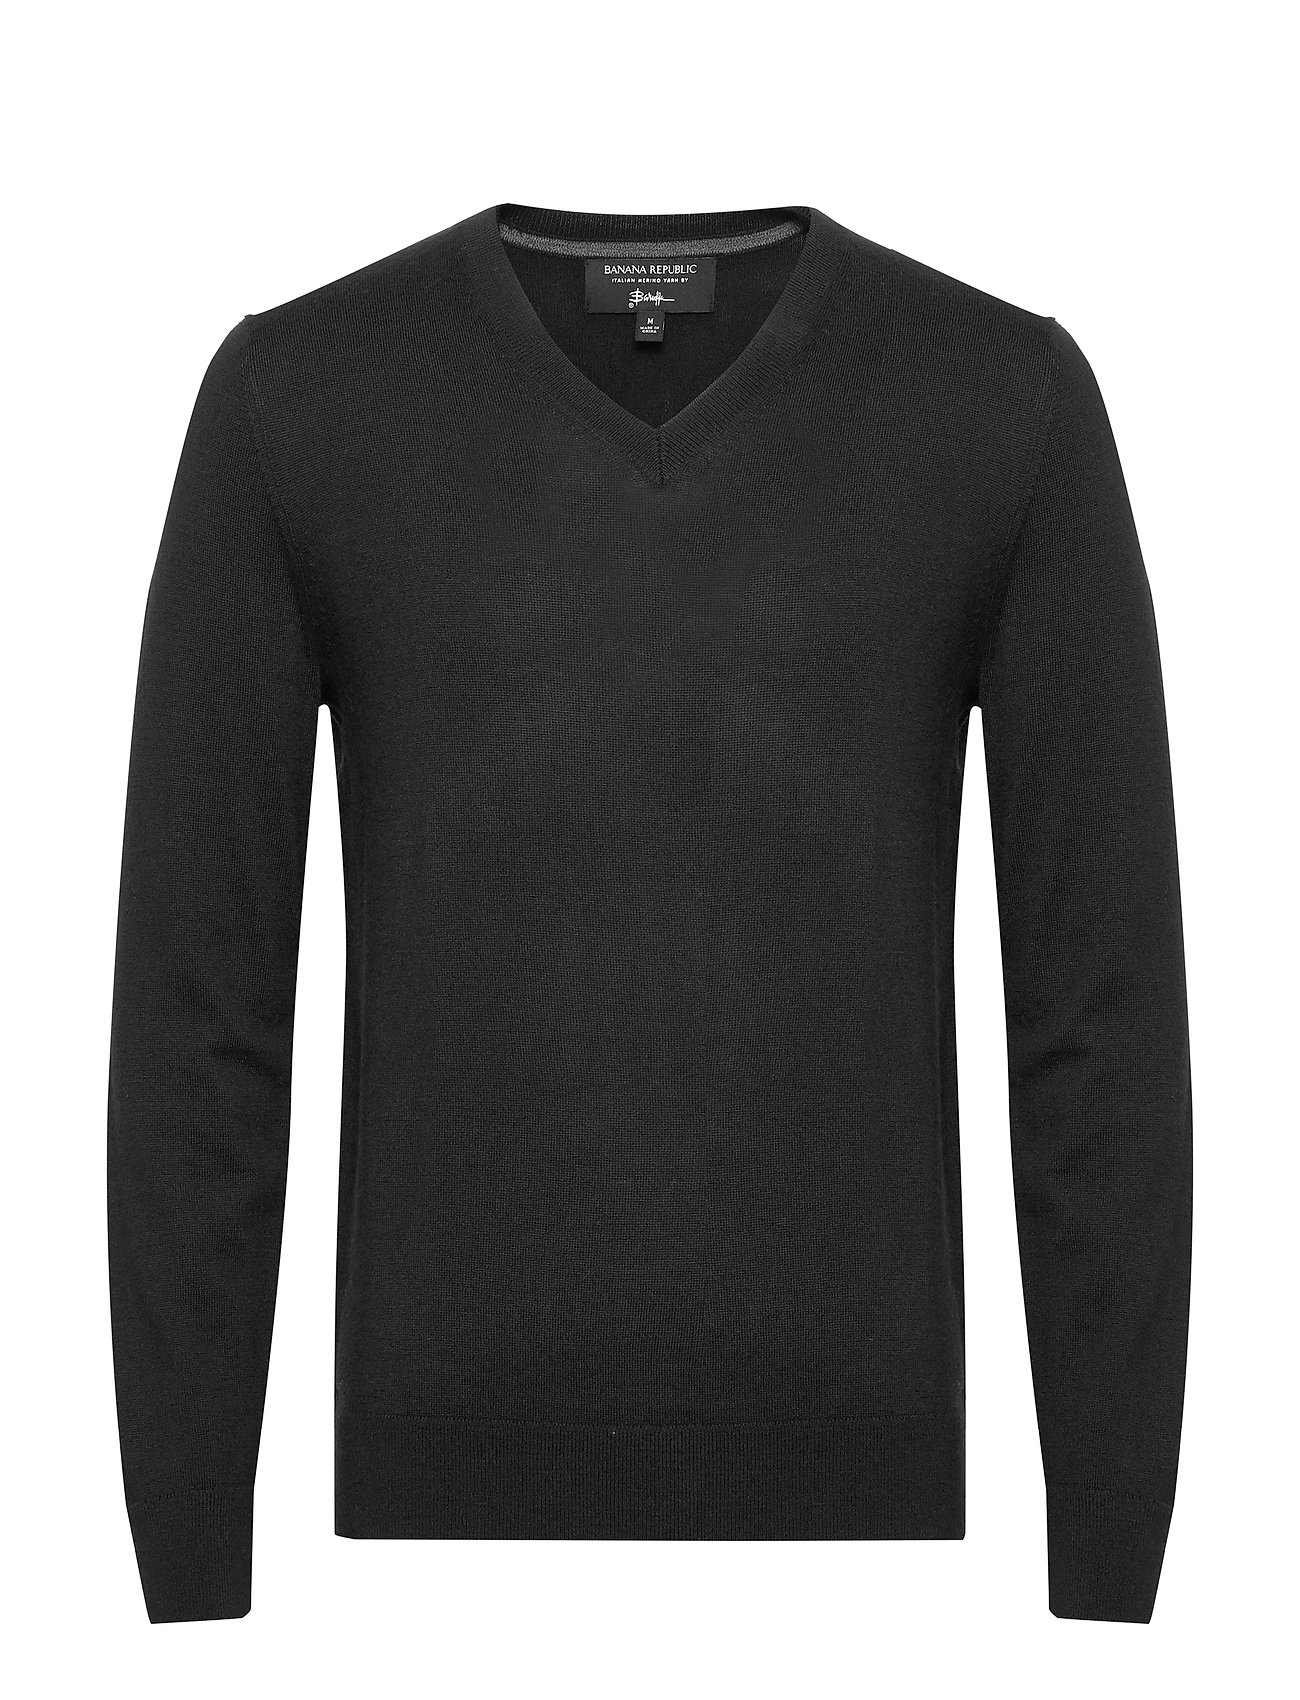 Banana Republic Italian Merino V-Neck Sweater - BLACK